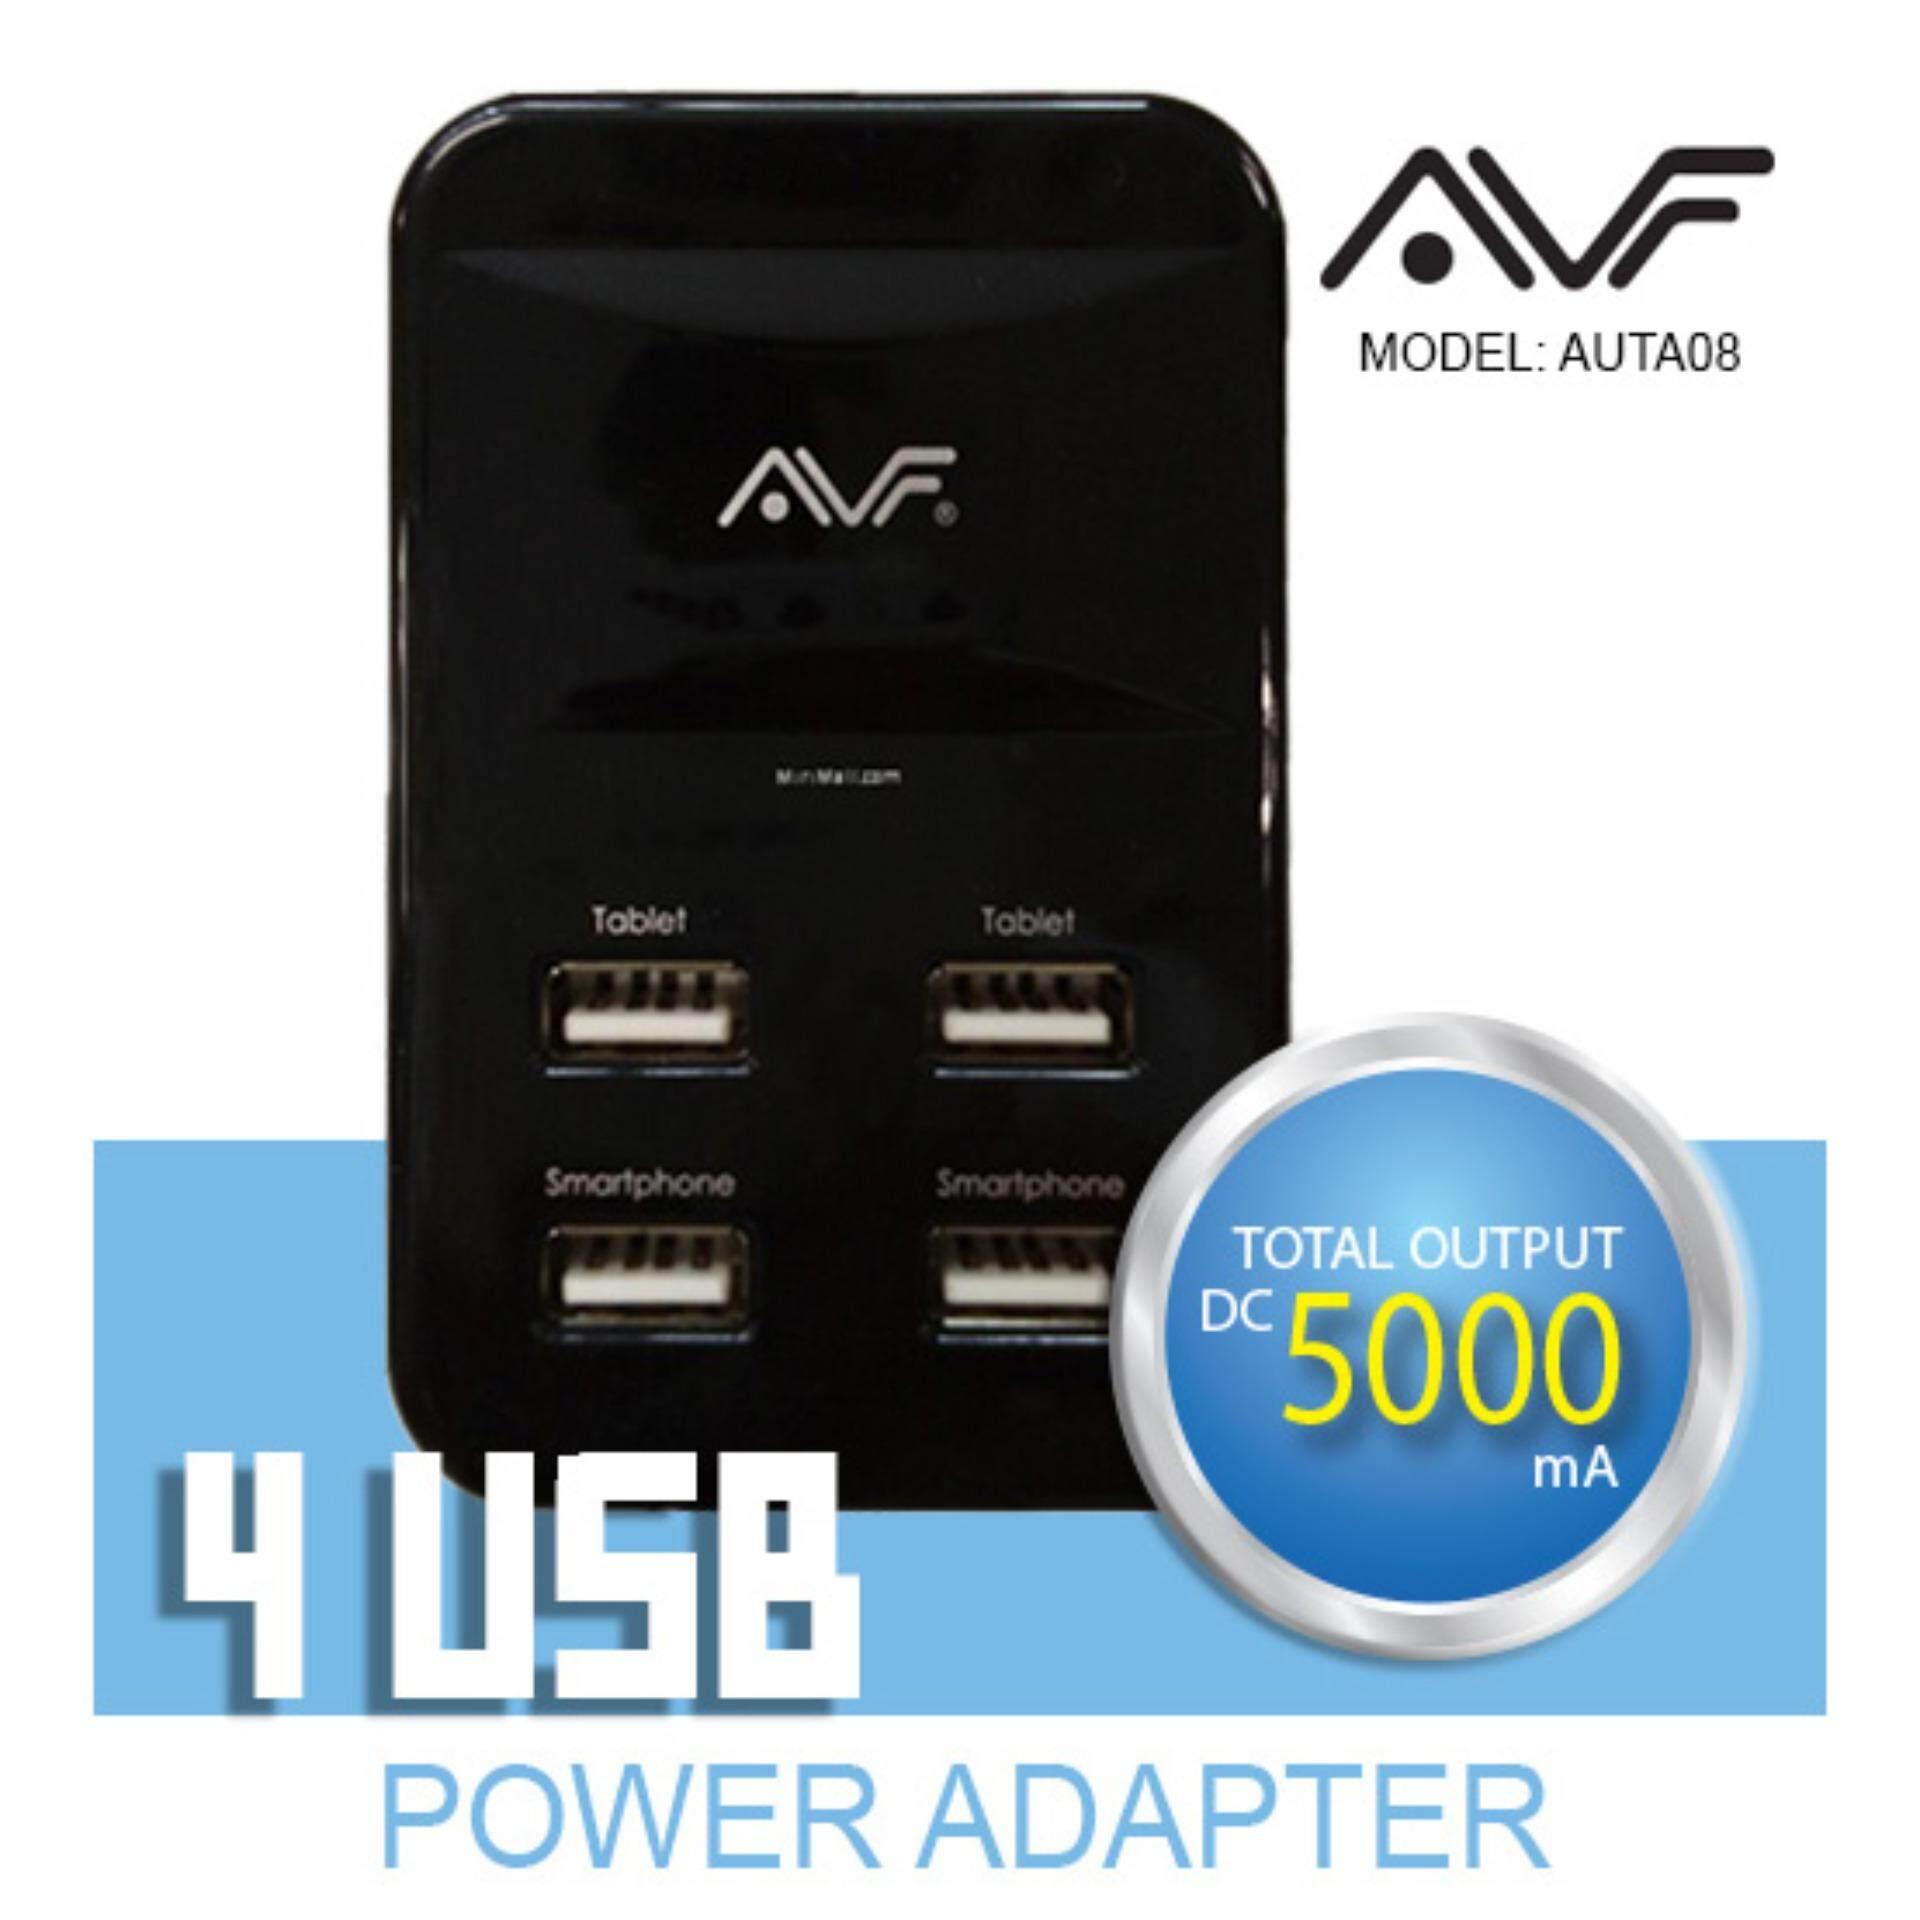 AVF 4 Port USB Power Adapter 5000Ma Output DC5000mA